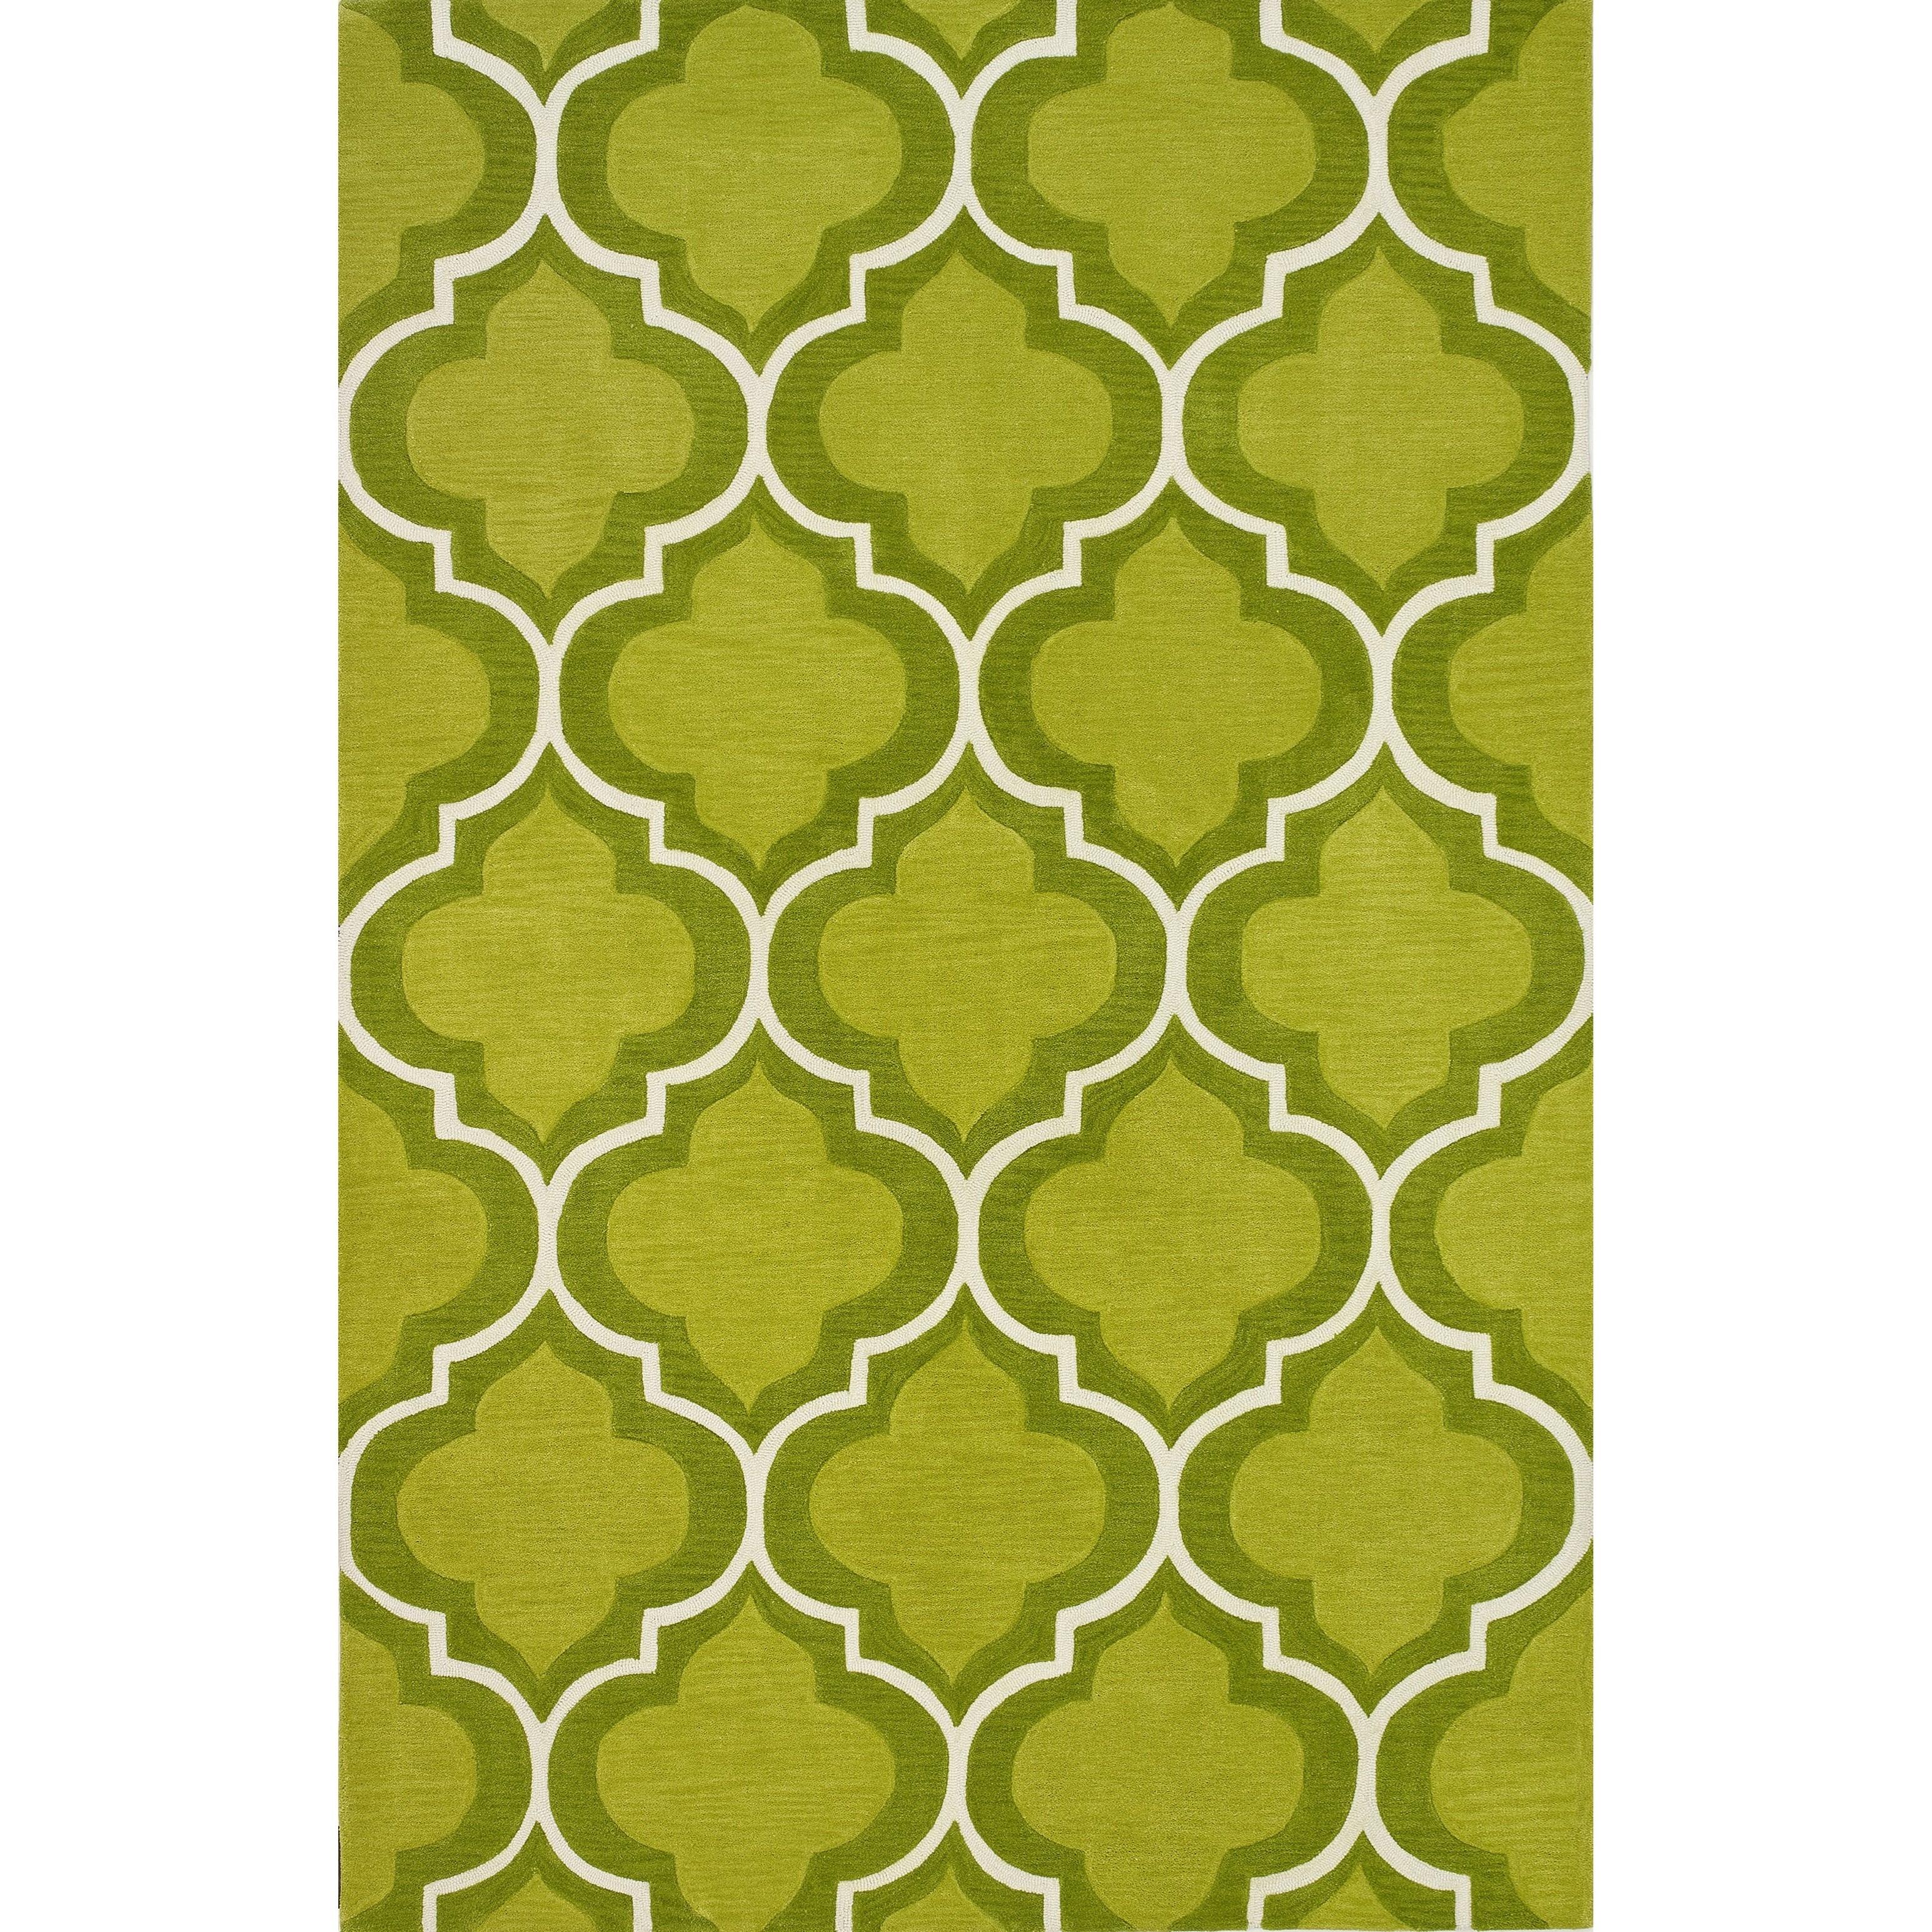 Dalyn Infinity Lime 8'X10' Rug - Item Number: IF3LI8X10